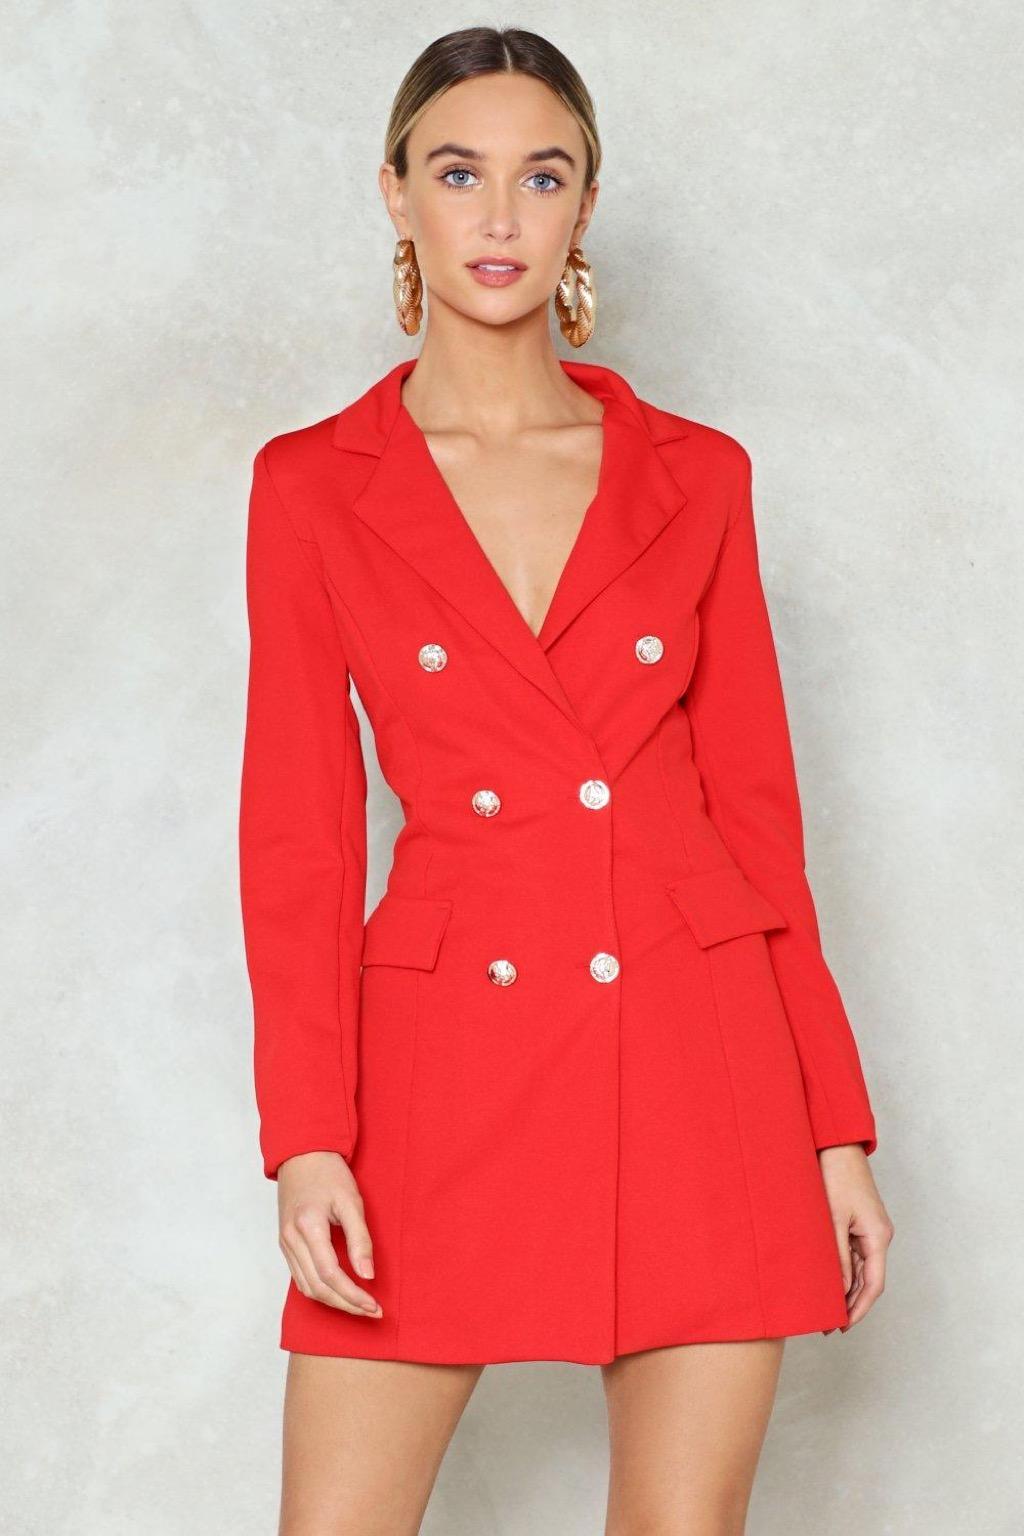 Nasty gal red dress